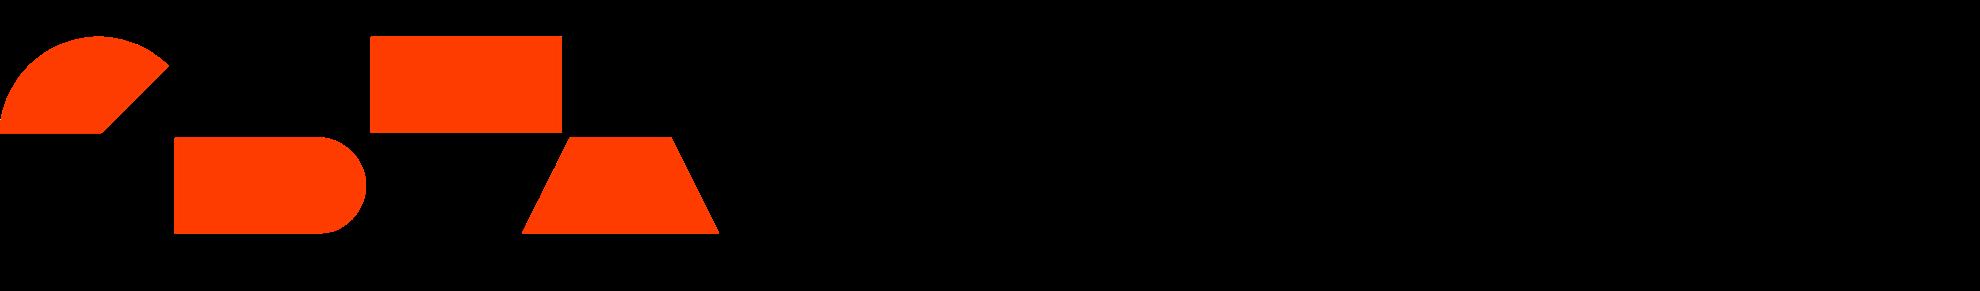 CSTA Maryland logo